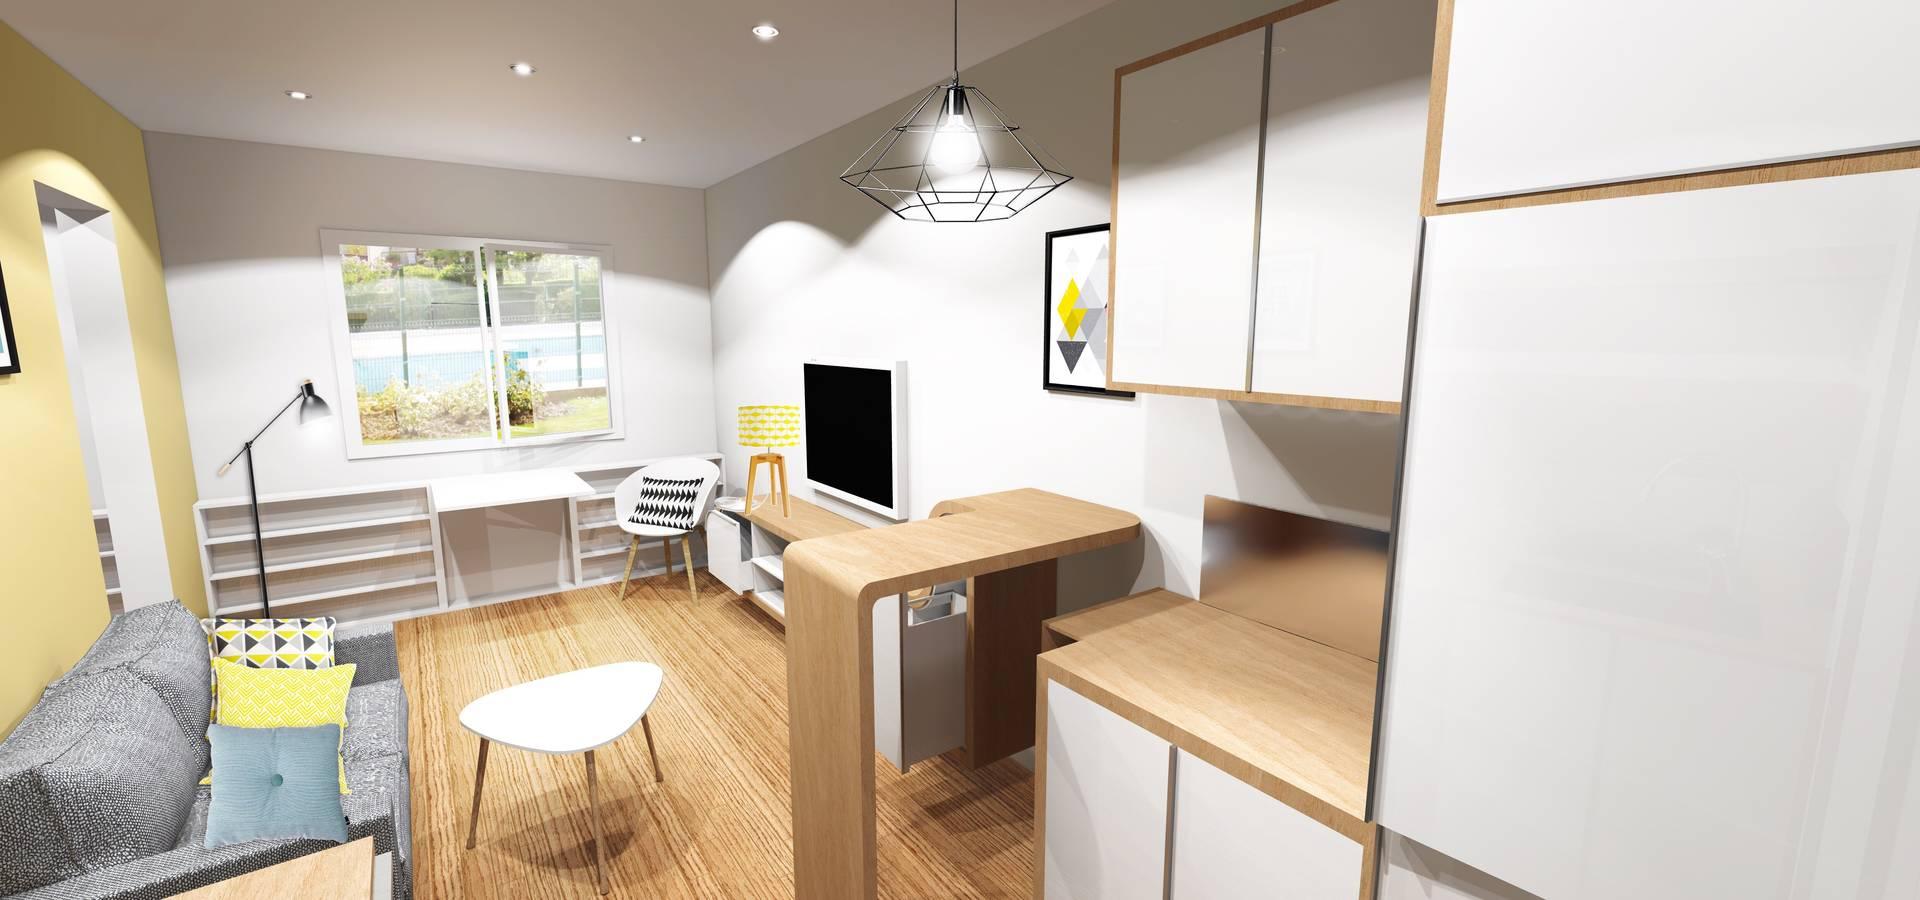 studio de gosni design homify. Black Bedroom Furniture Sets. Home Design Ideas